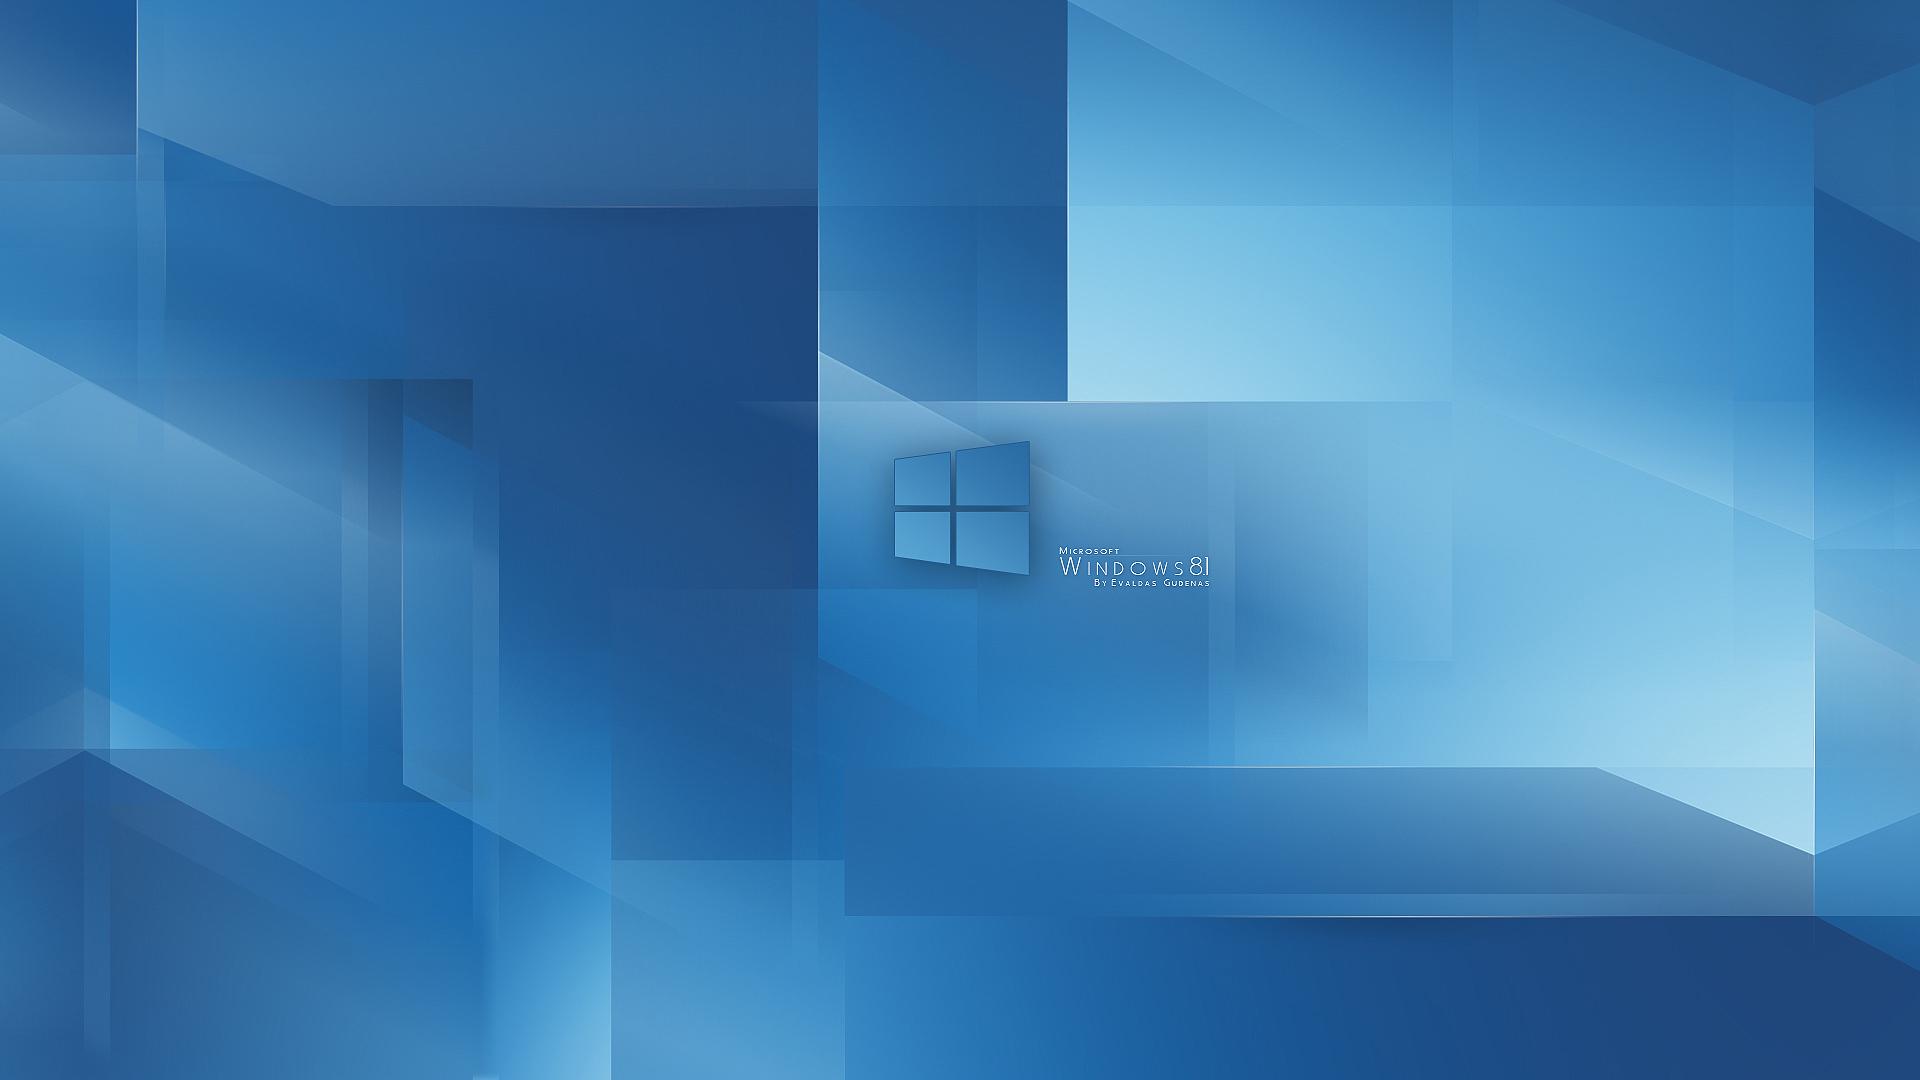 smart windows 8 1 wallpaperjpg 1920x1080